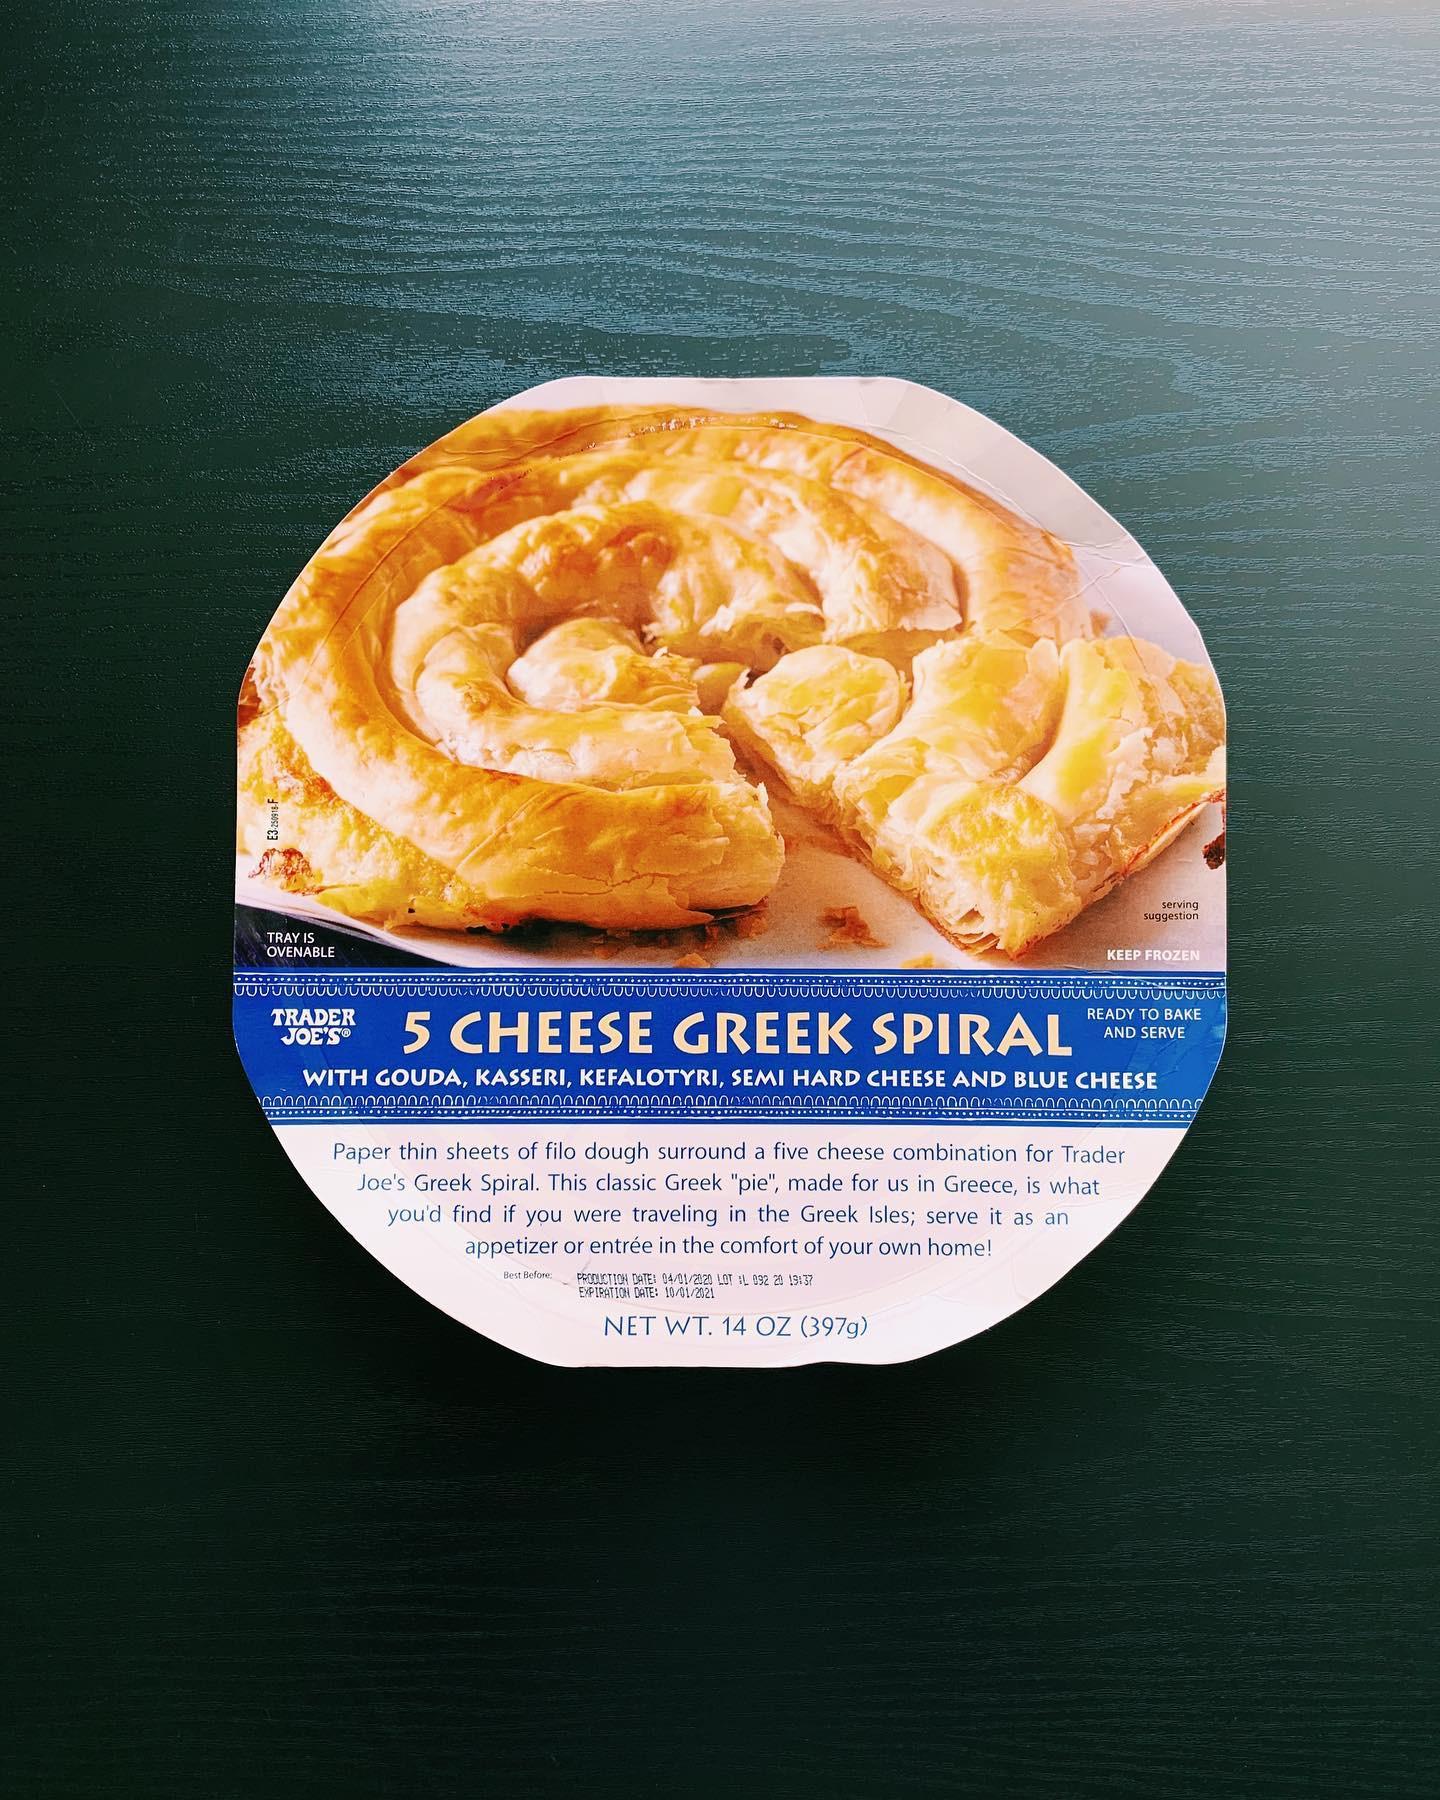 5 Cheese Greek Spiral: 8/10